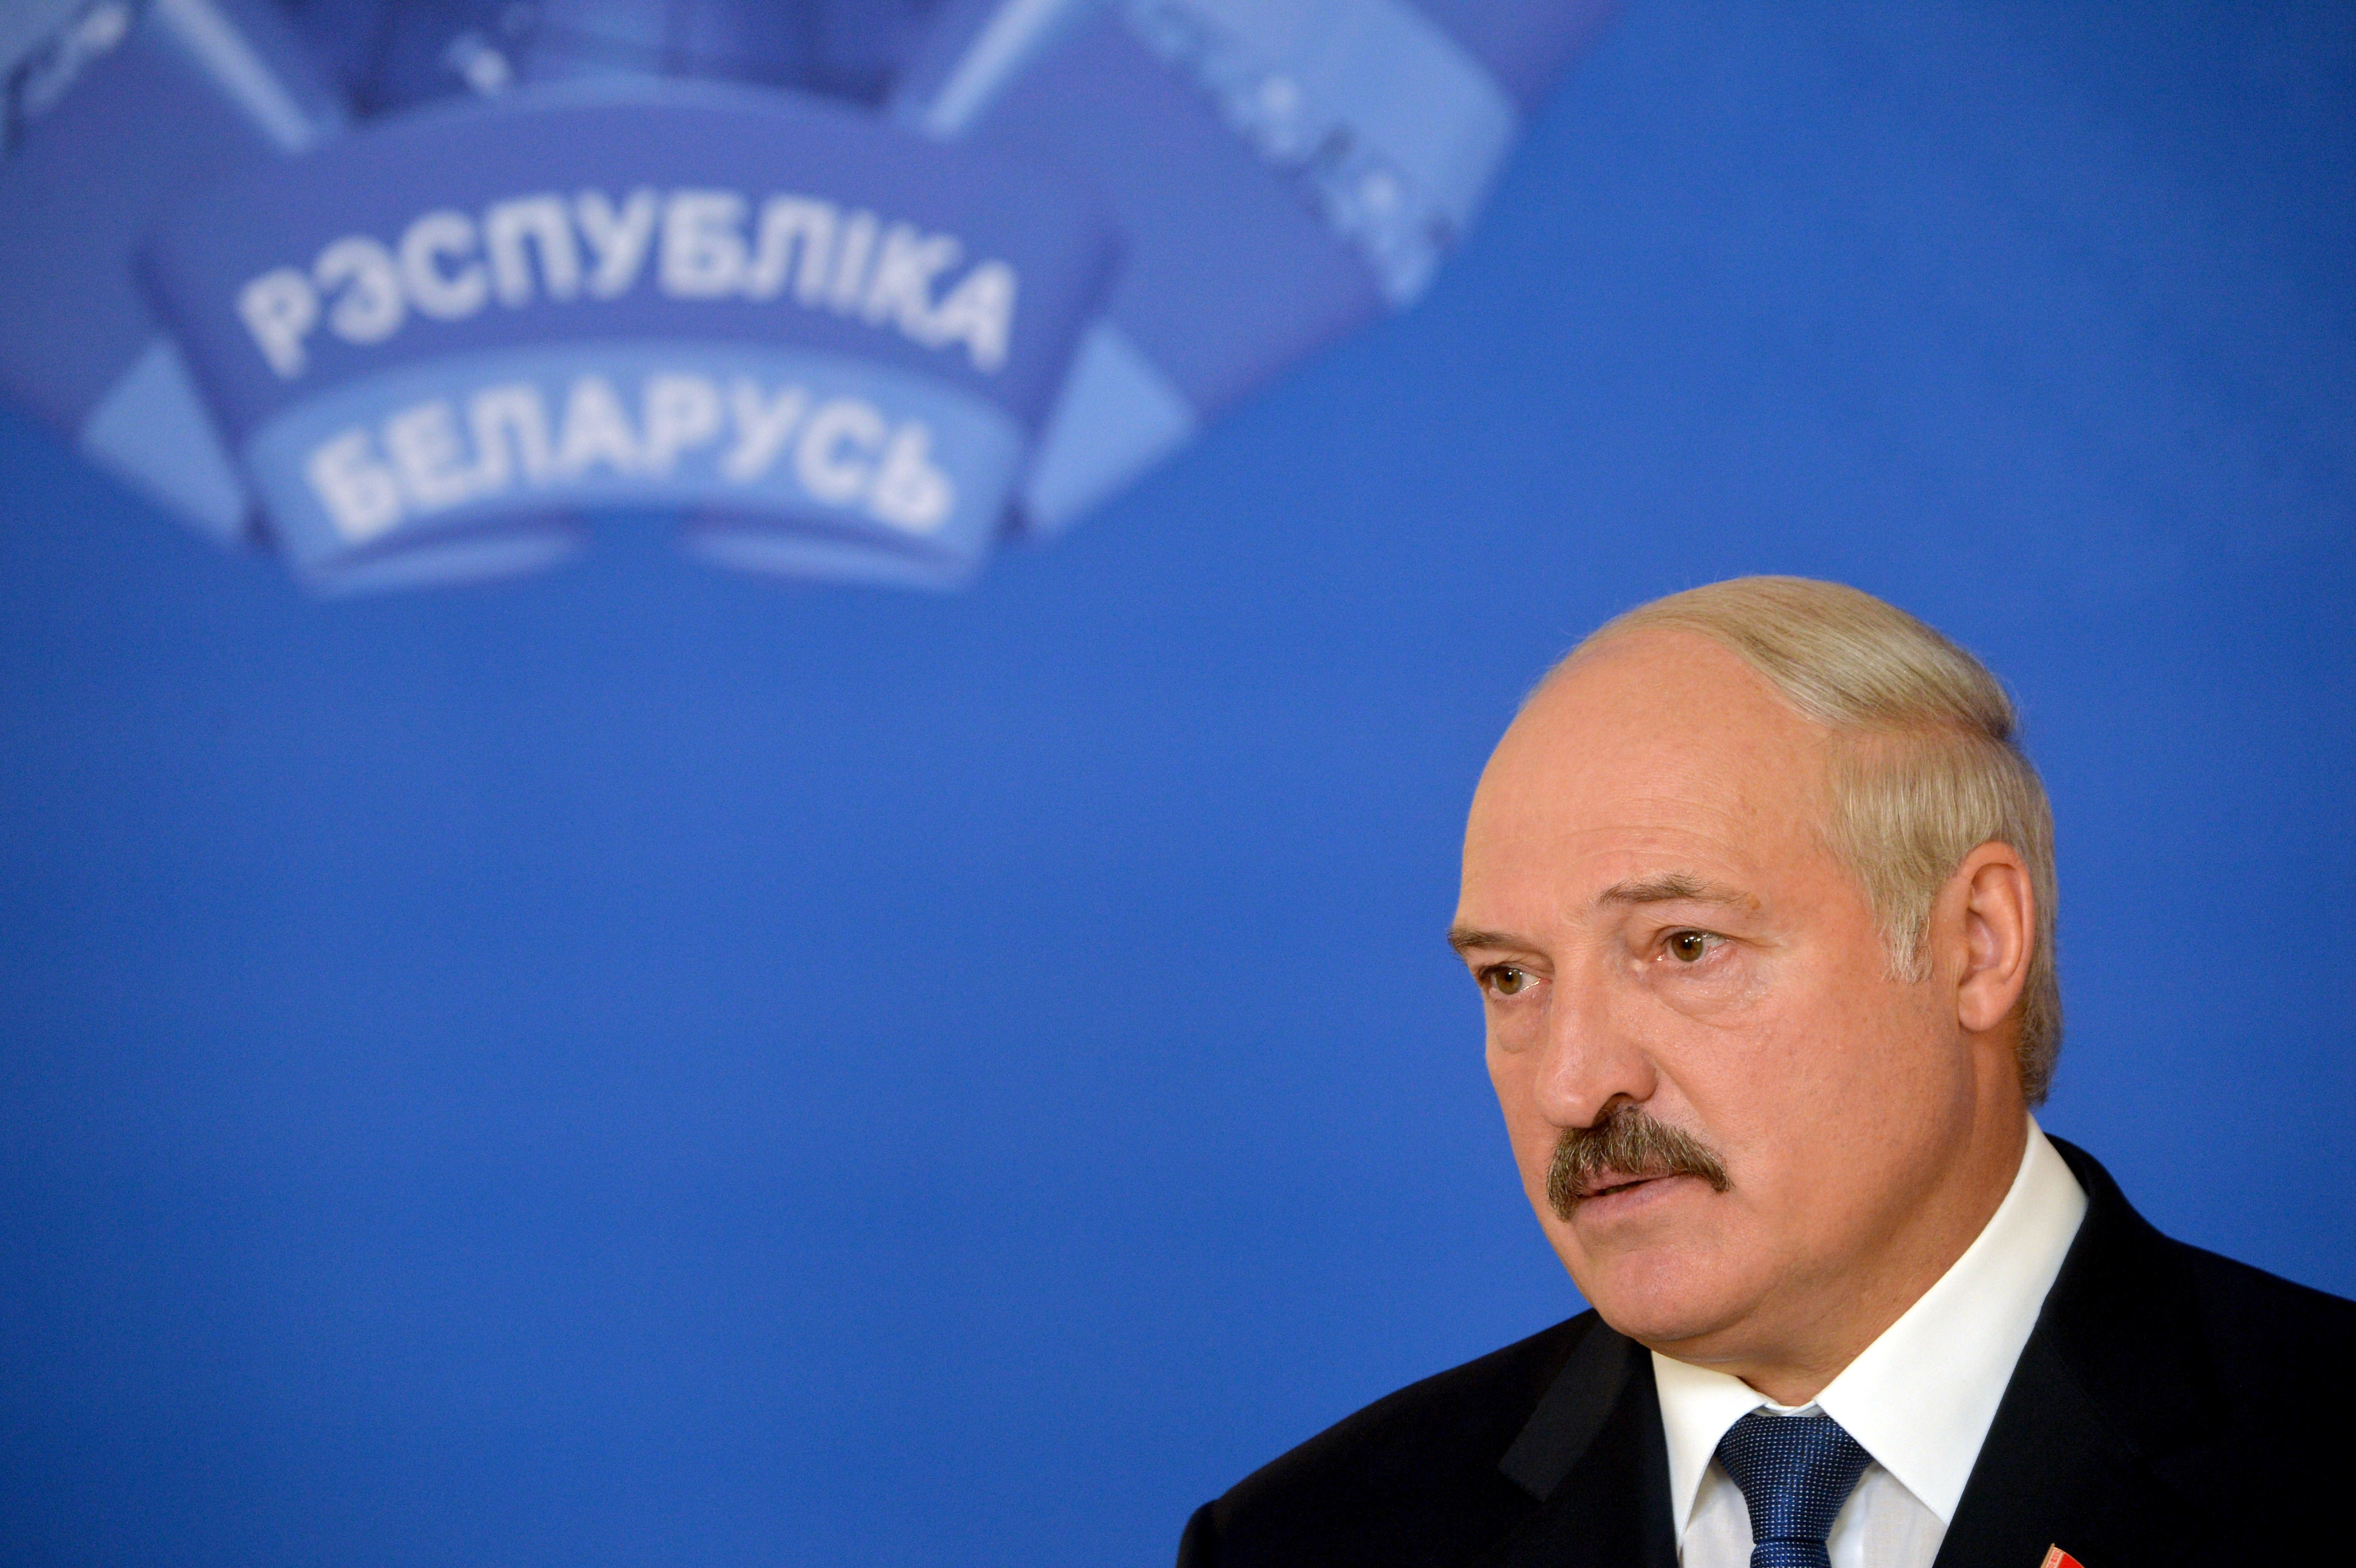 Belarus' President Alexander Lukashenko speaks with journalists at a polling station in Minsk, Belarus, on Oct. 11, 2015